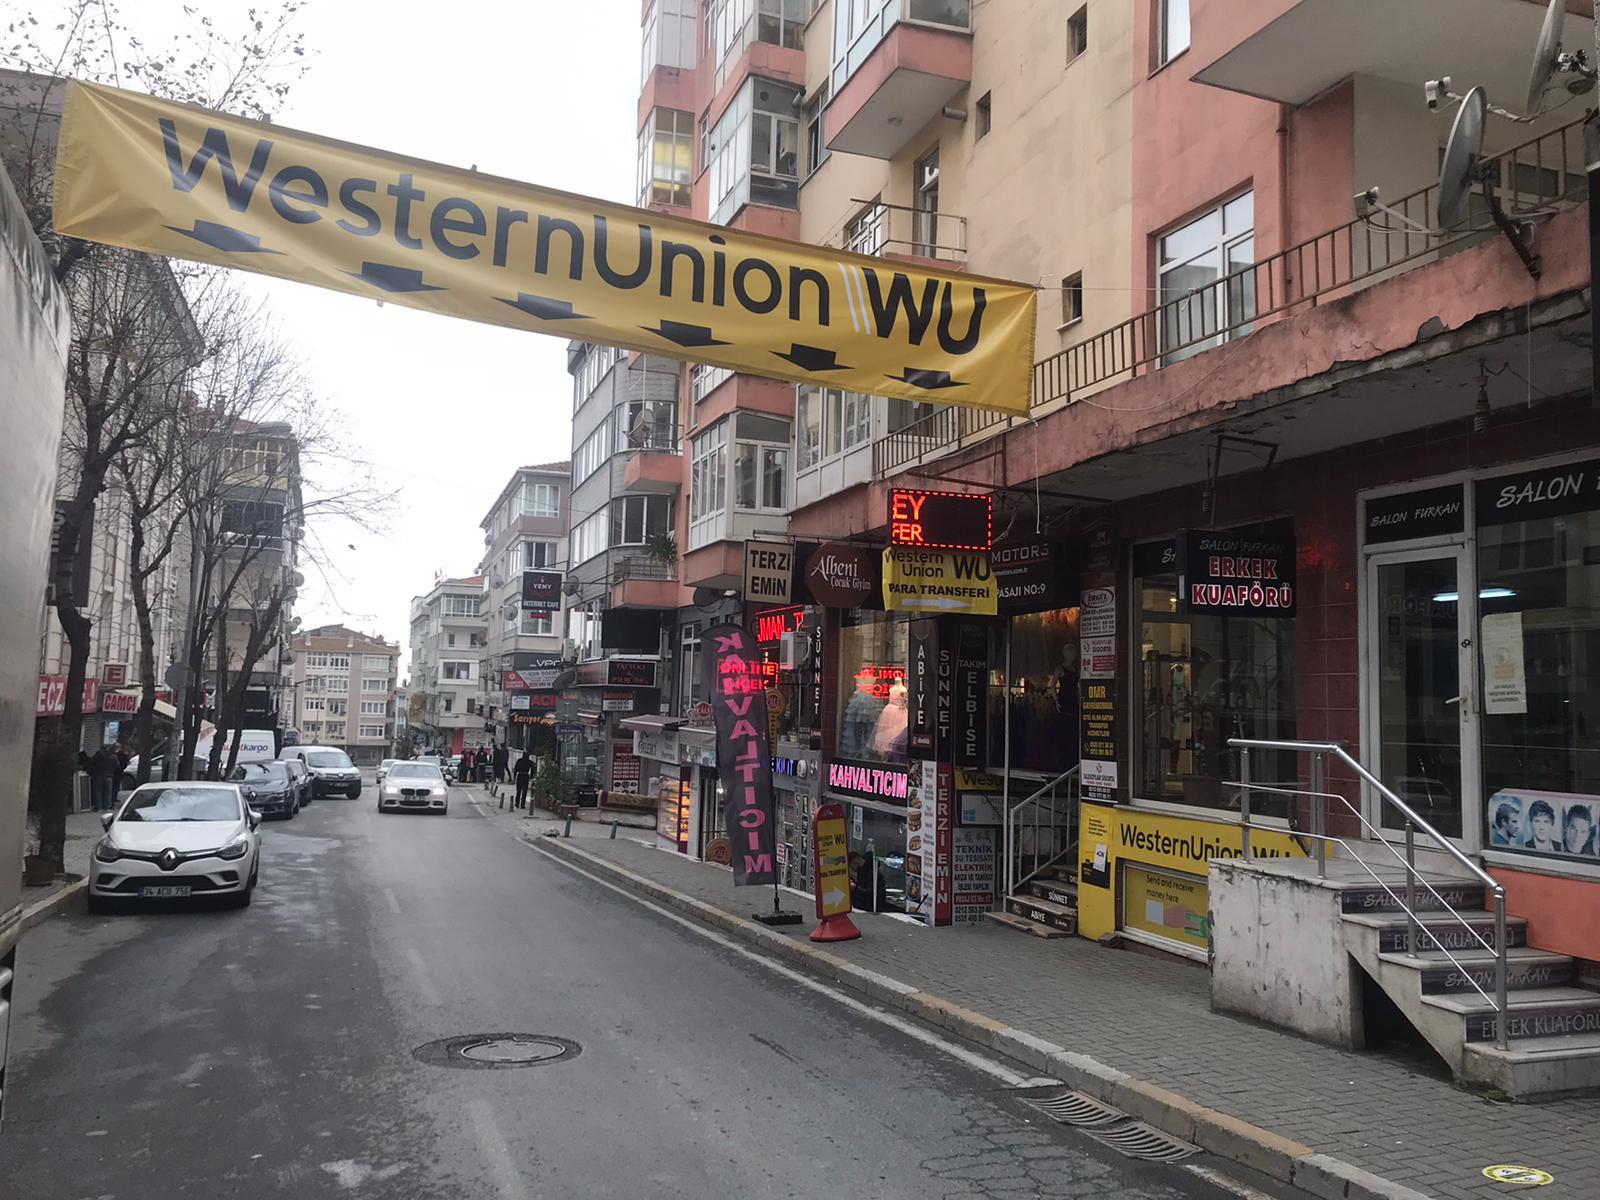 Western Union / PALA